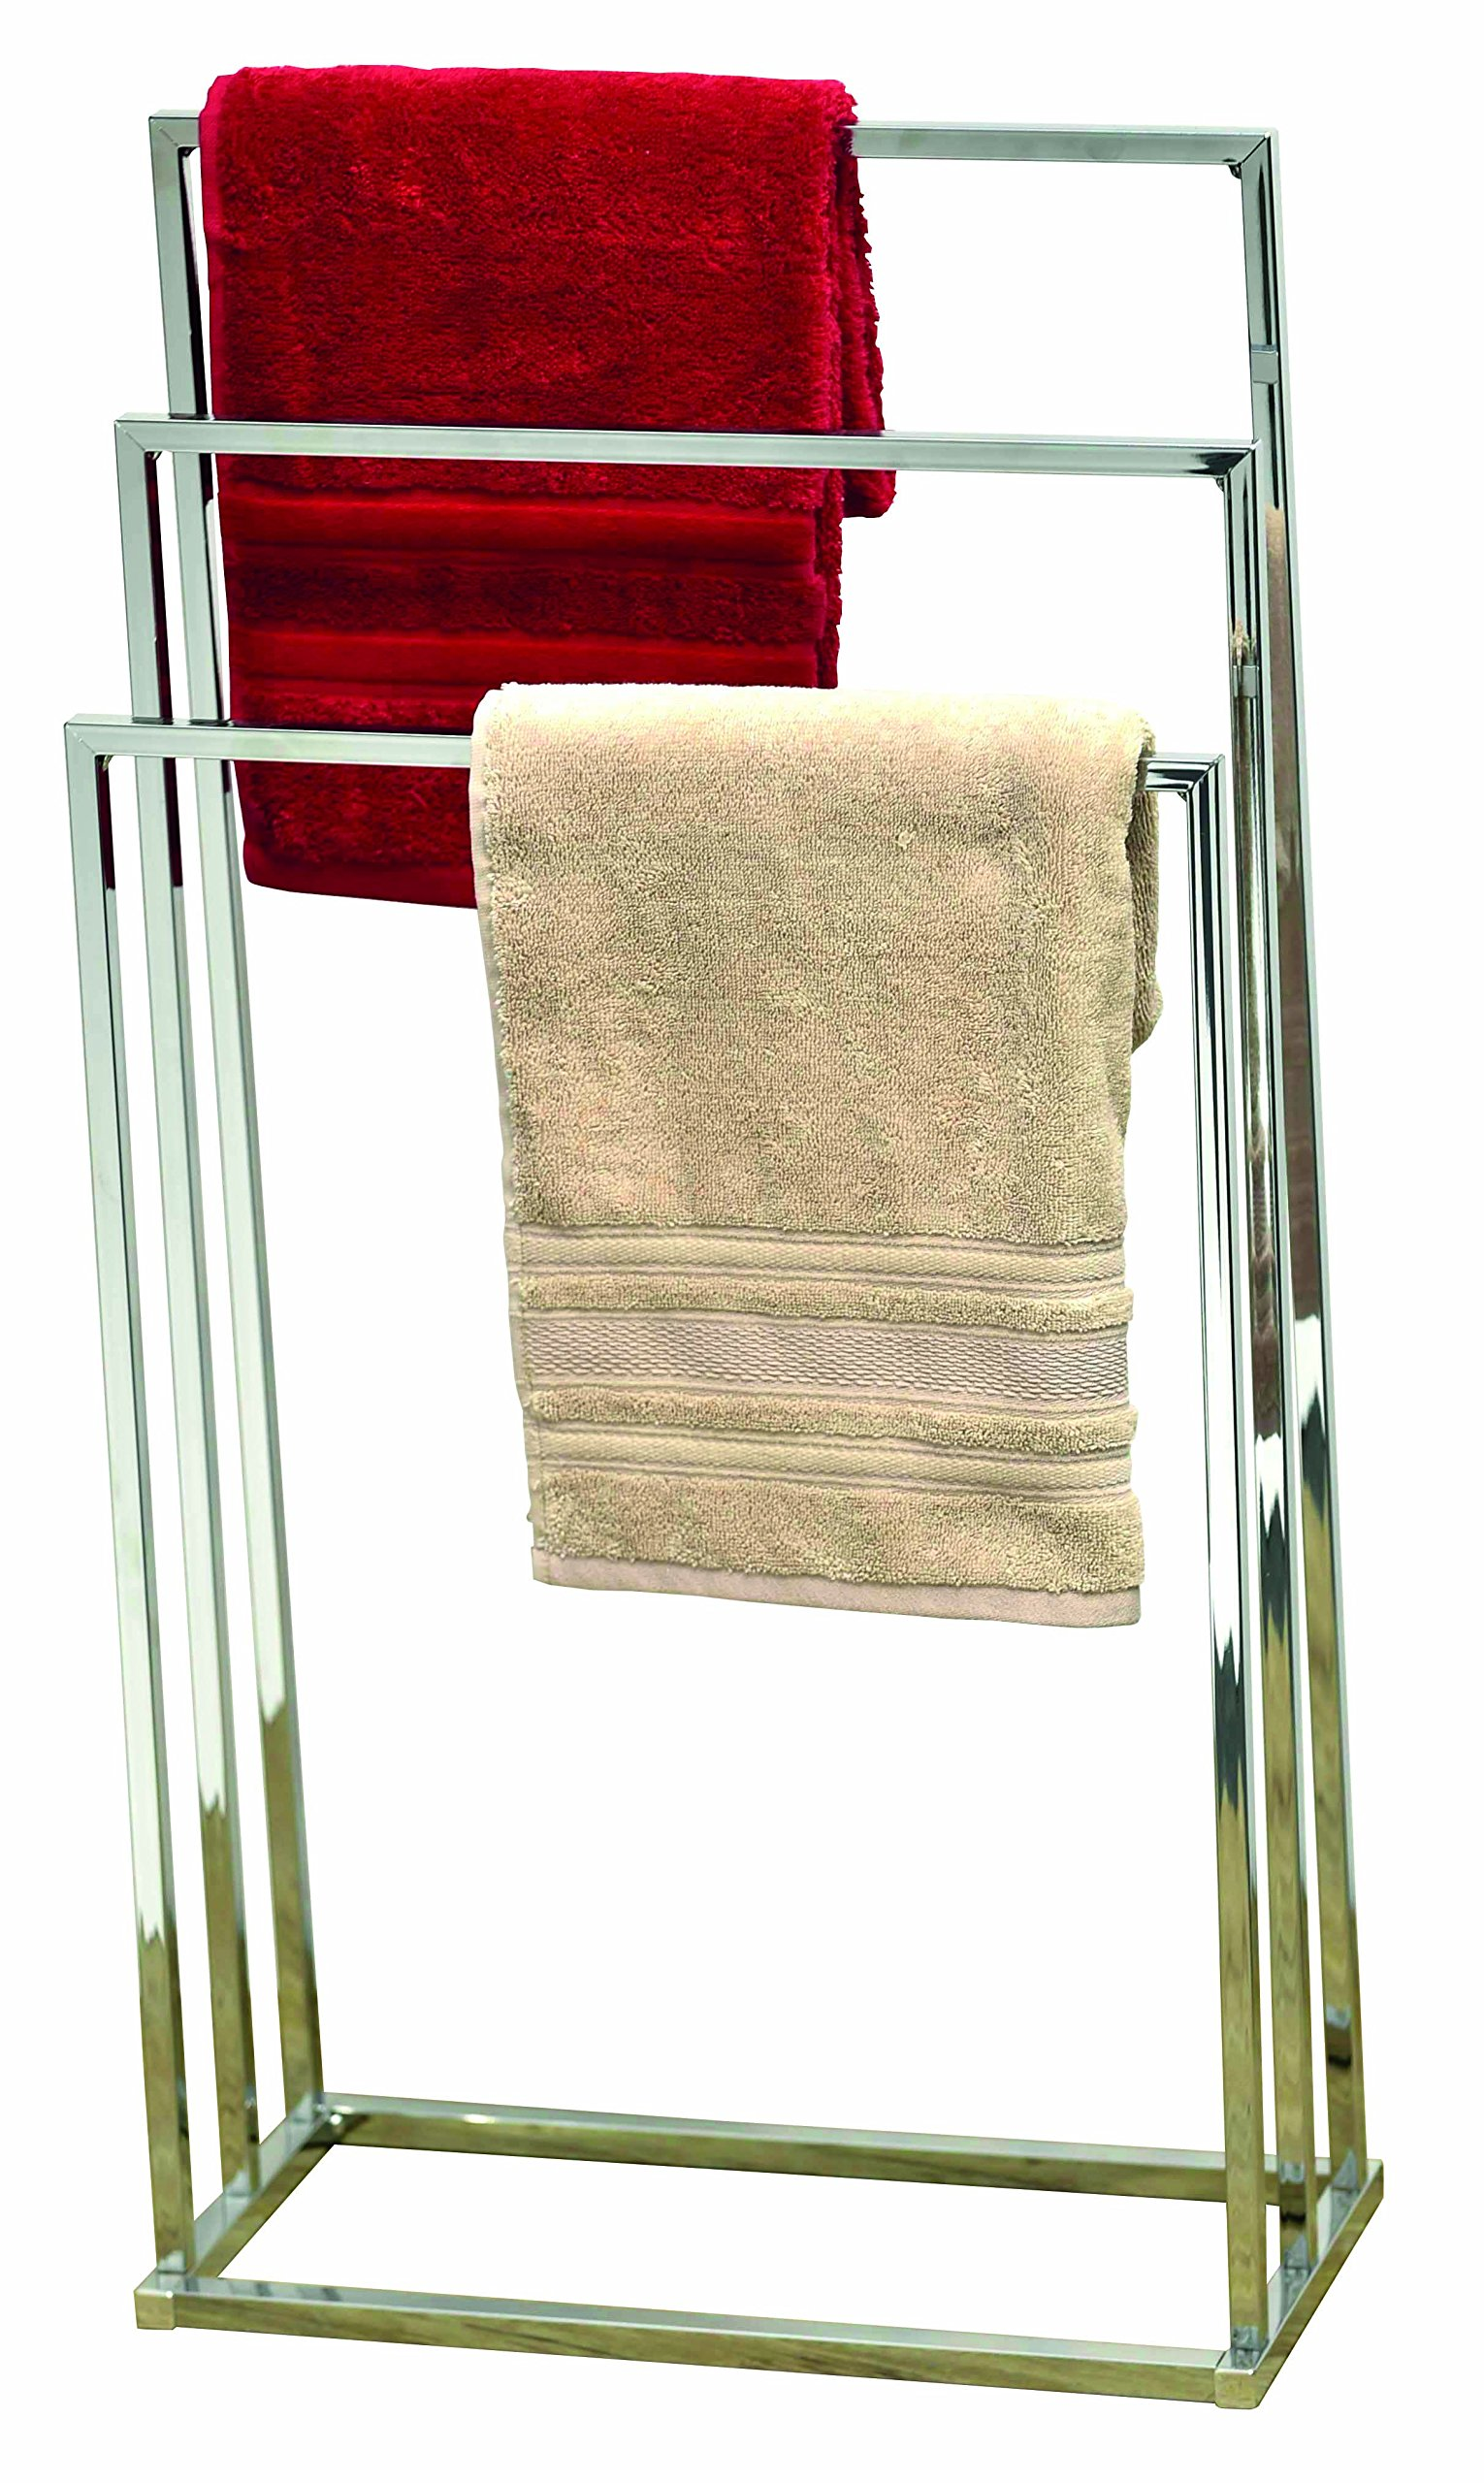 EVIDECO 9669102 3 Bar Towel Rack Square Tube Holder Metal Chrome